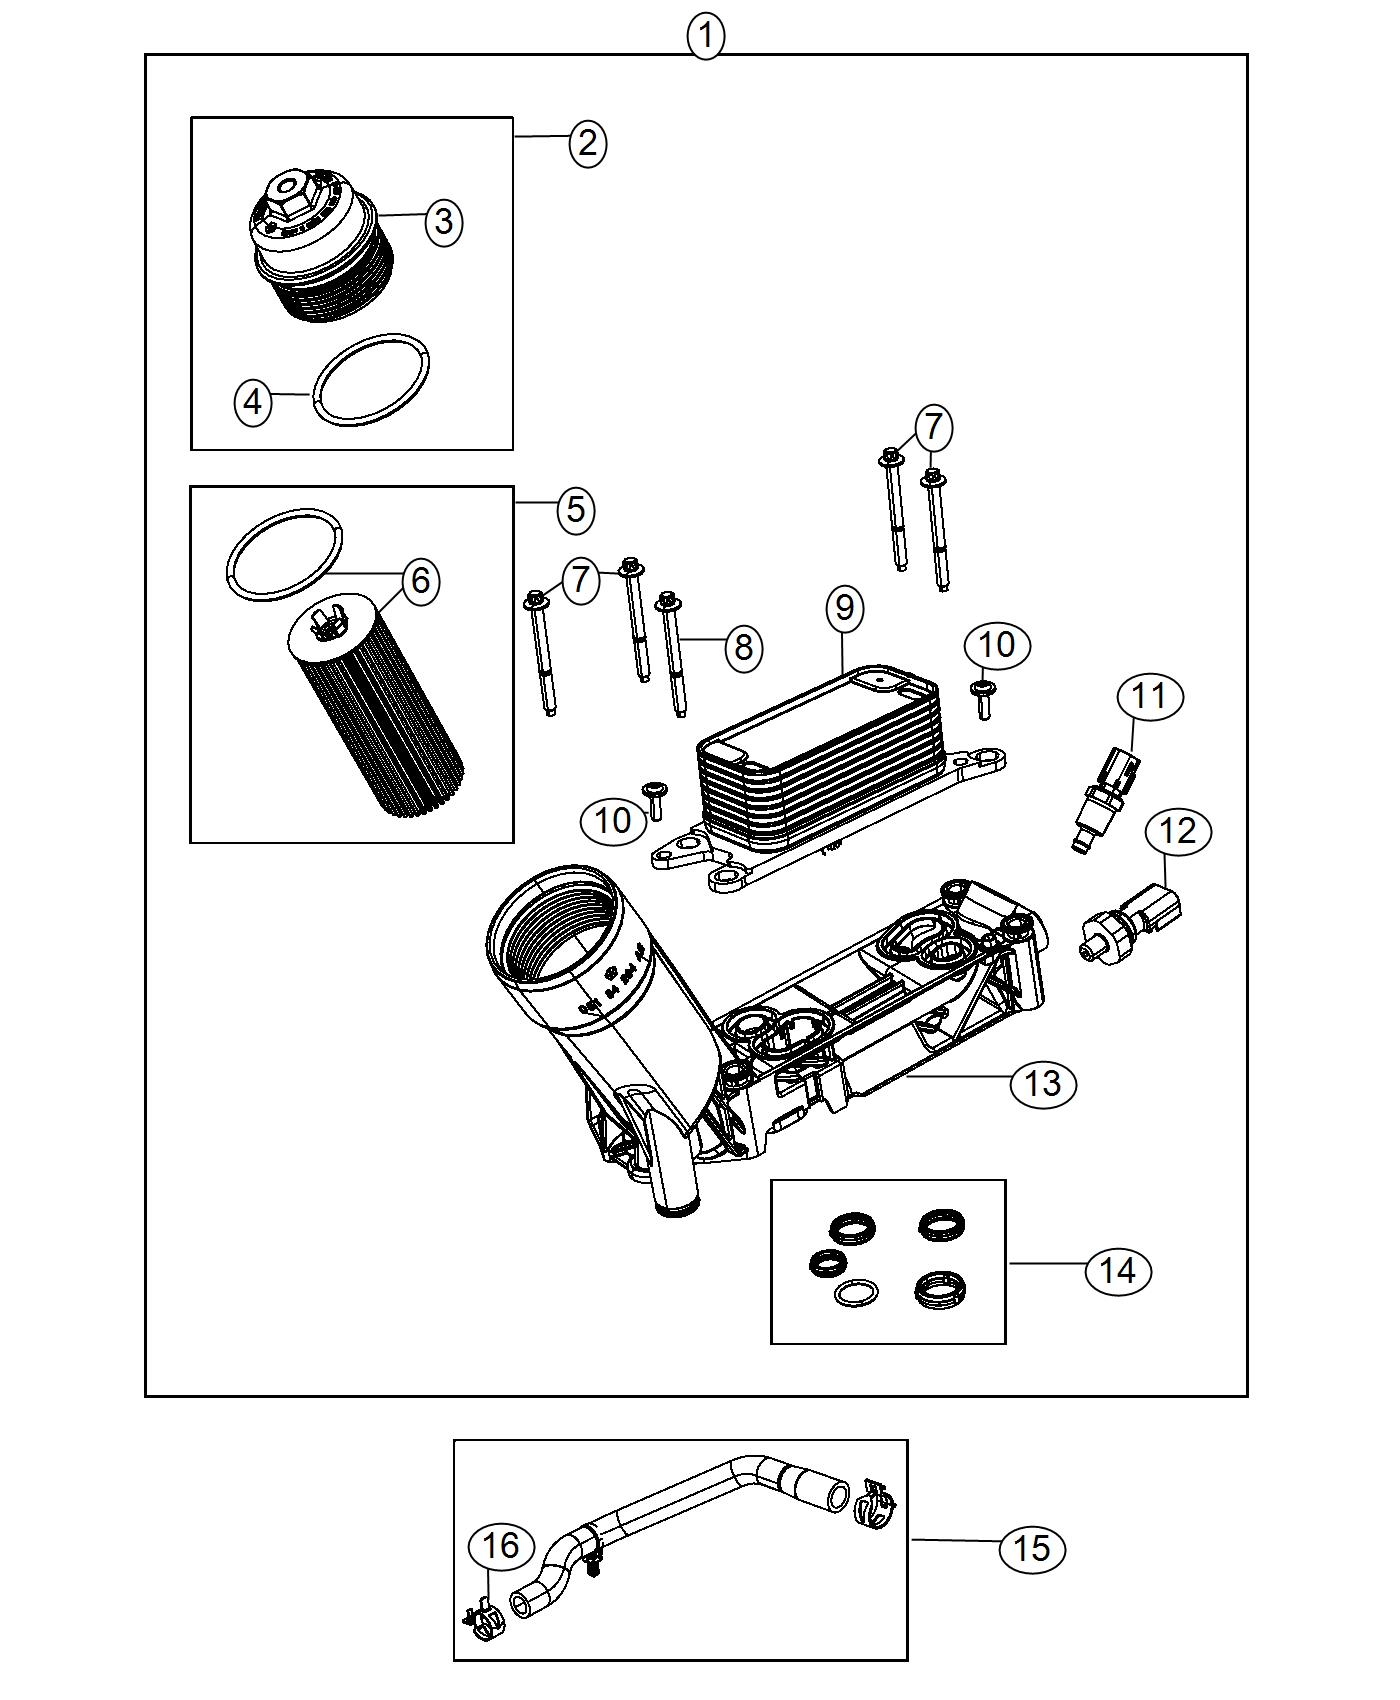 Ford 7 3 Oil Pressure